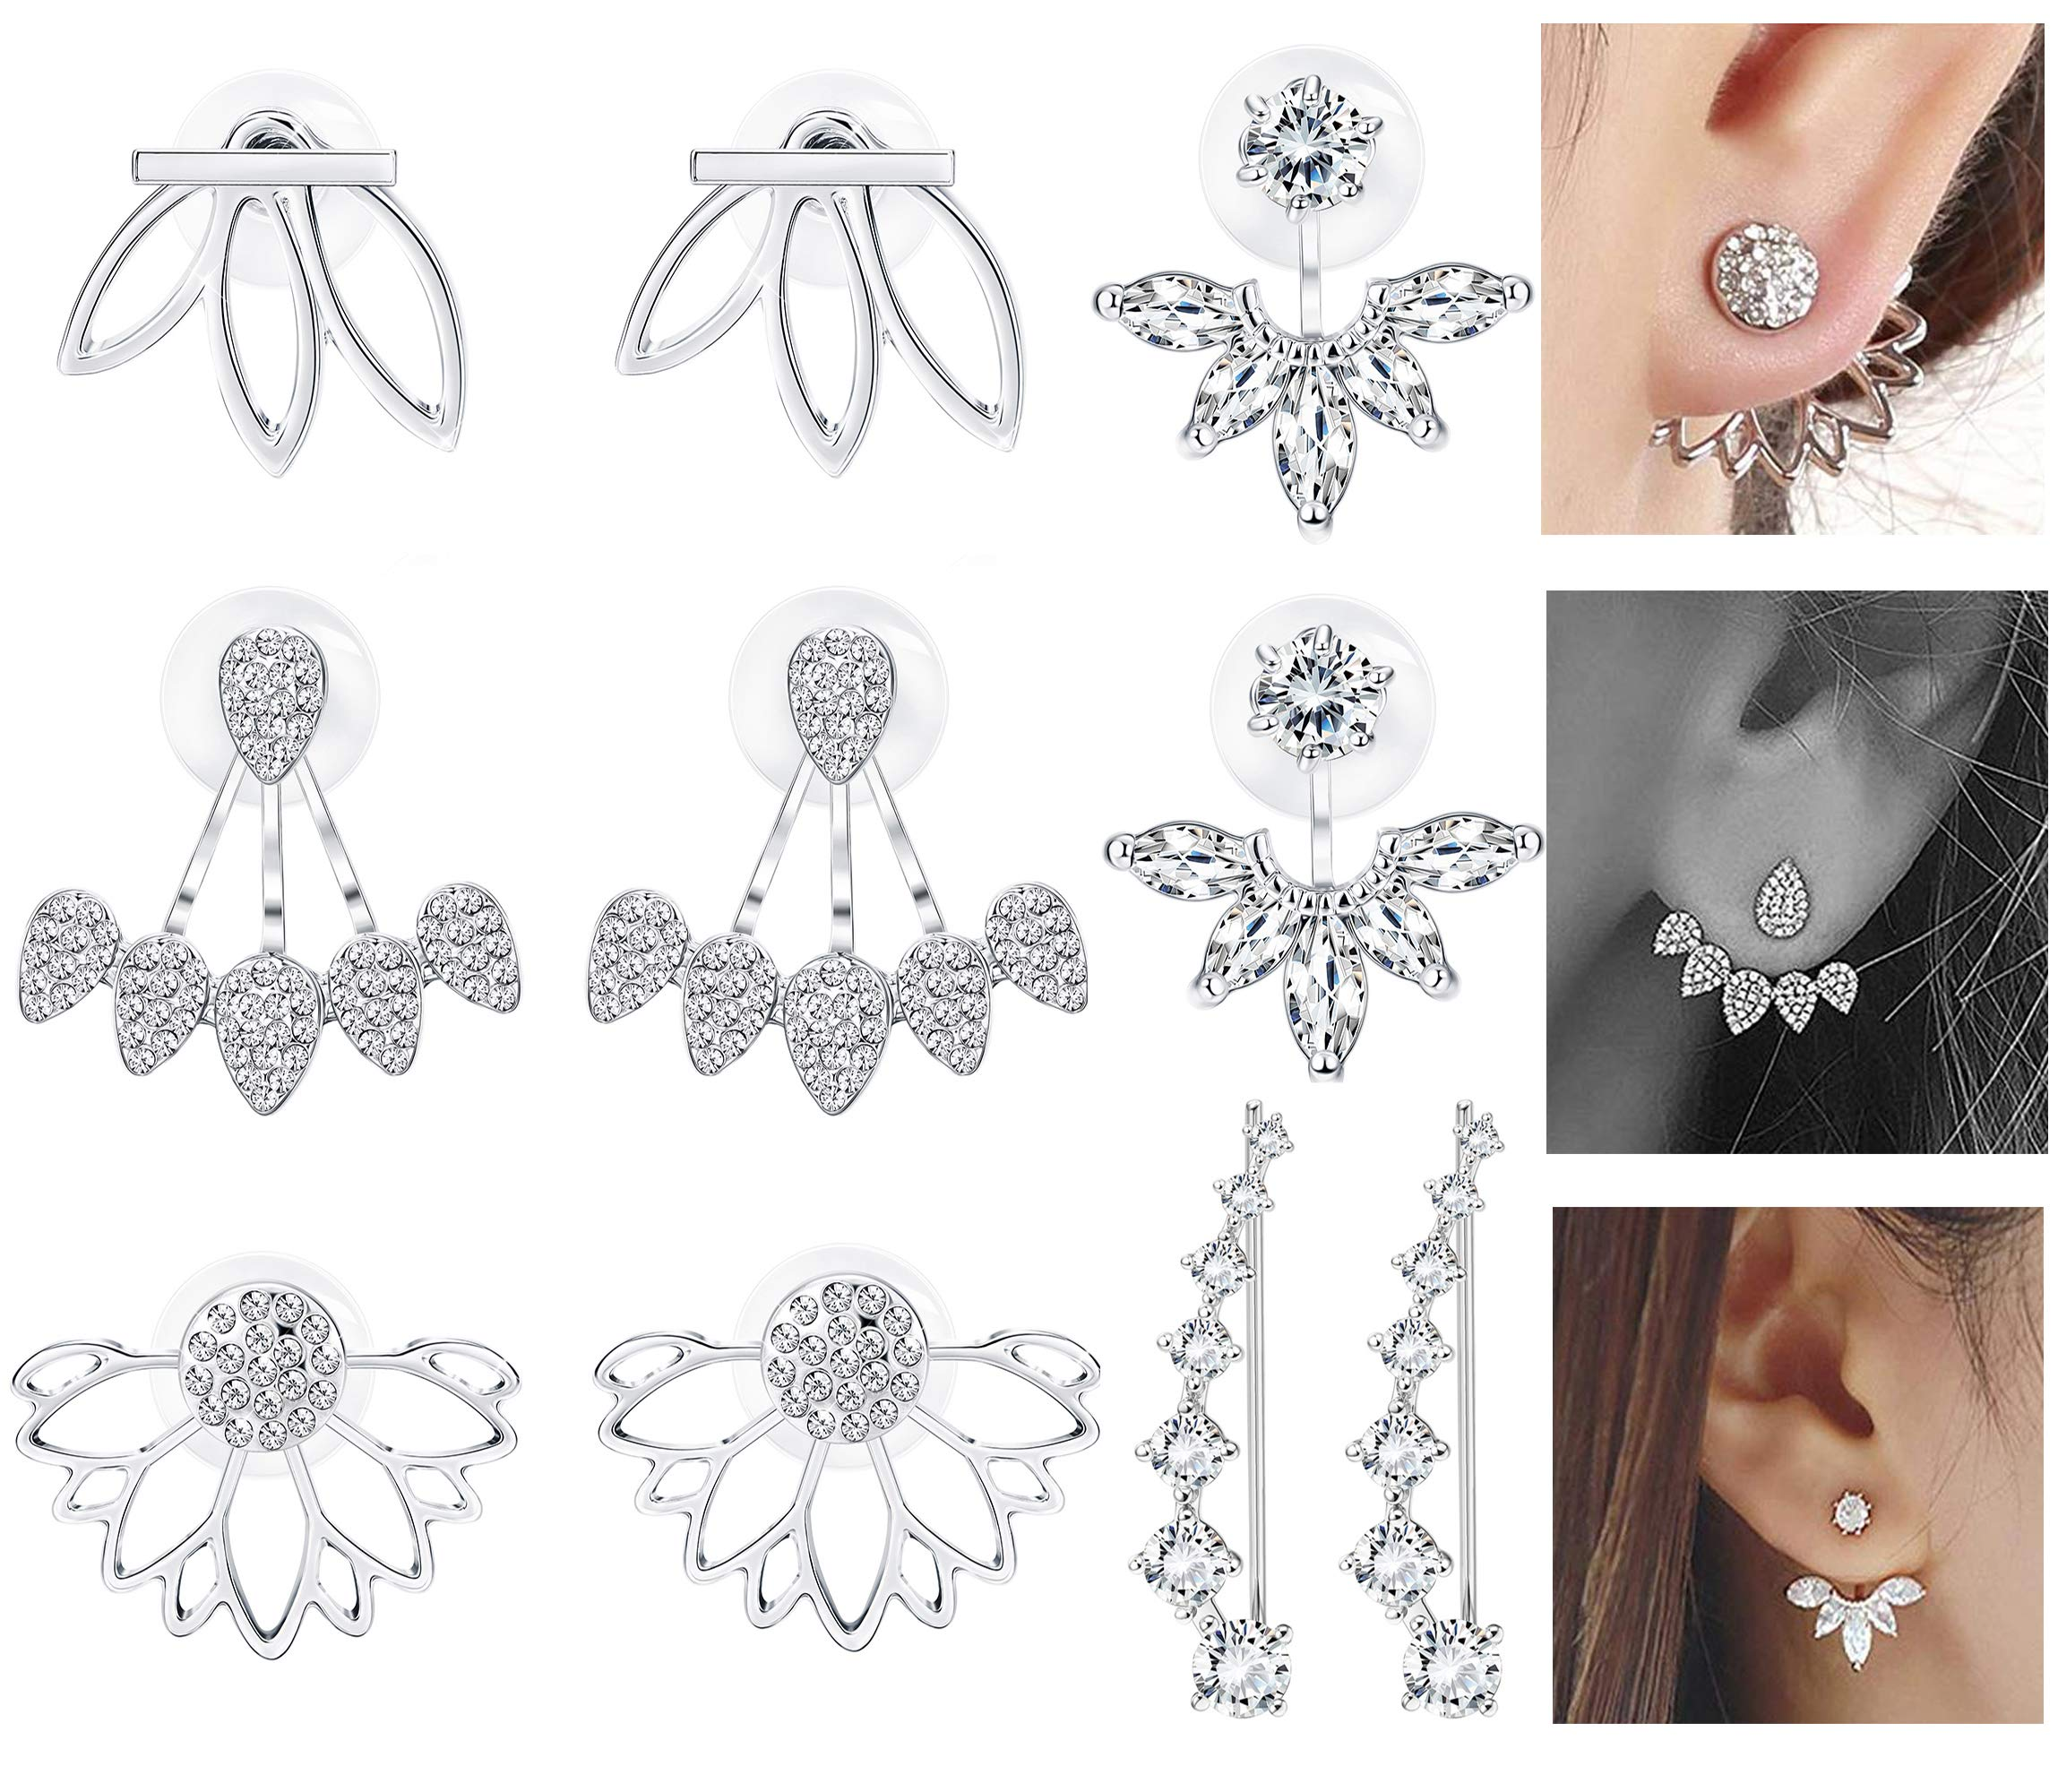 Milacolato 5 pairs Hollow Lotus Flower Ear Jackets For Women Girls Ear Stud Simple Chic Earrings Silver